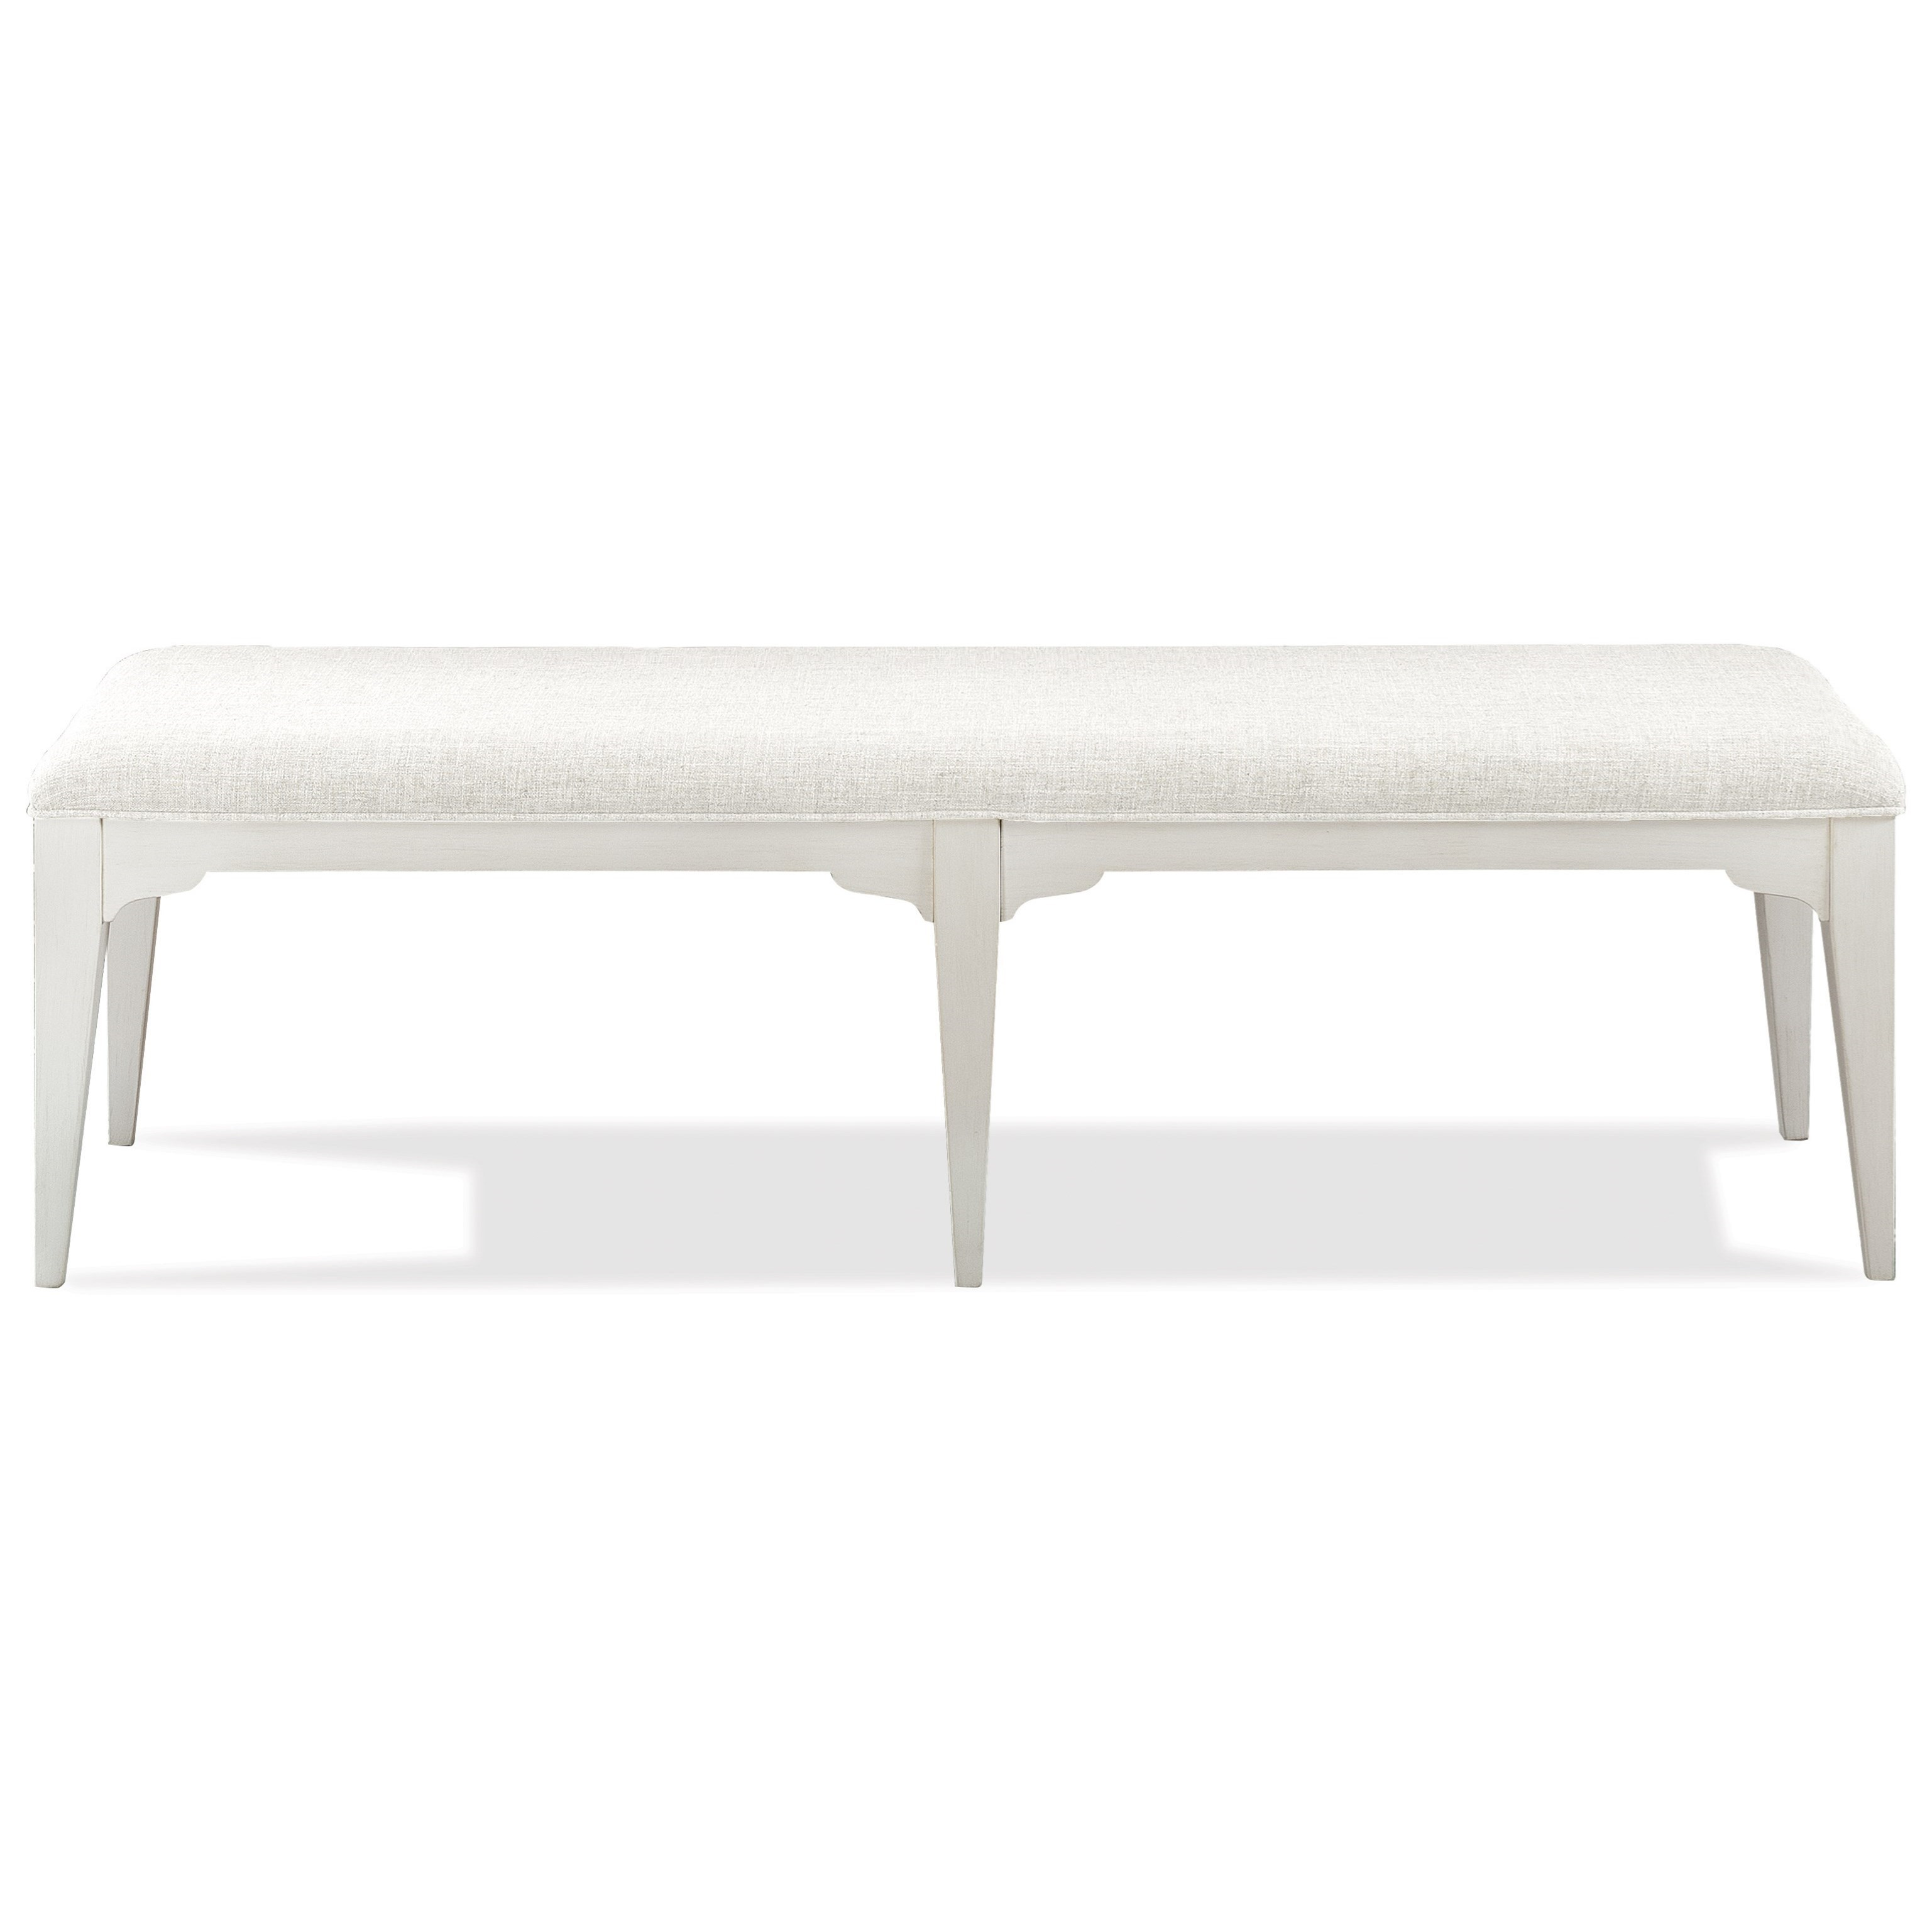 Riverside Furniture Myra 59359 Upholstered Dining Bench